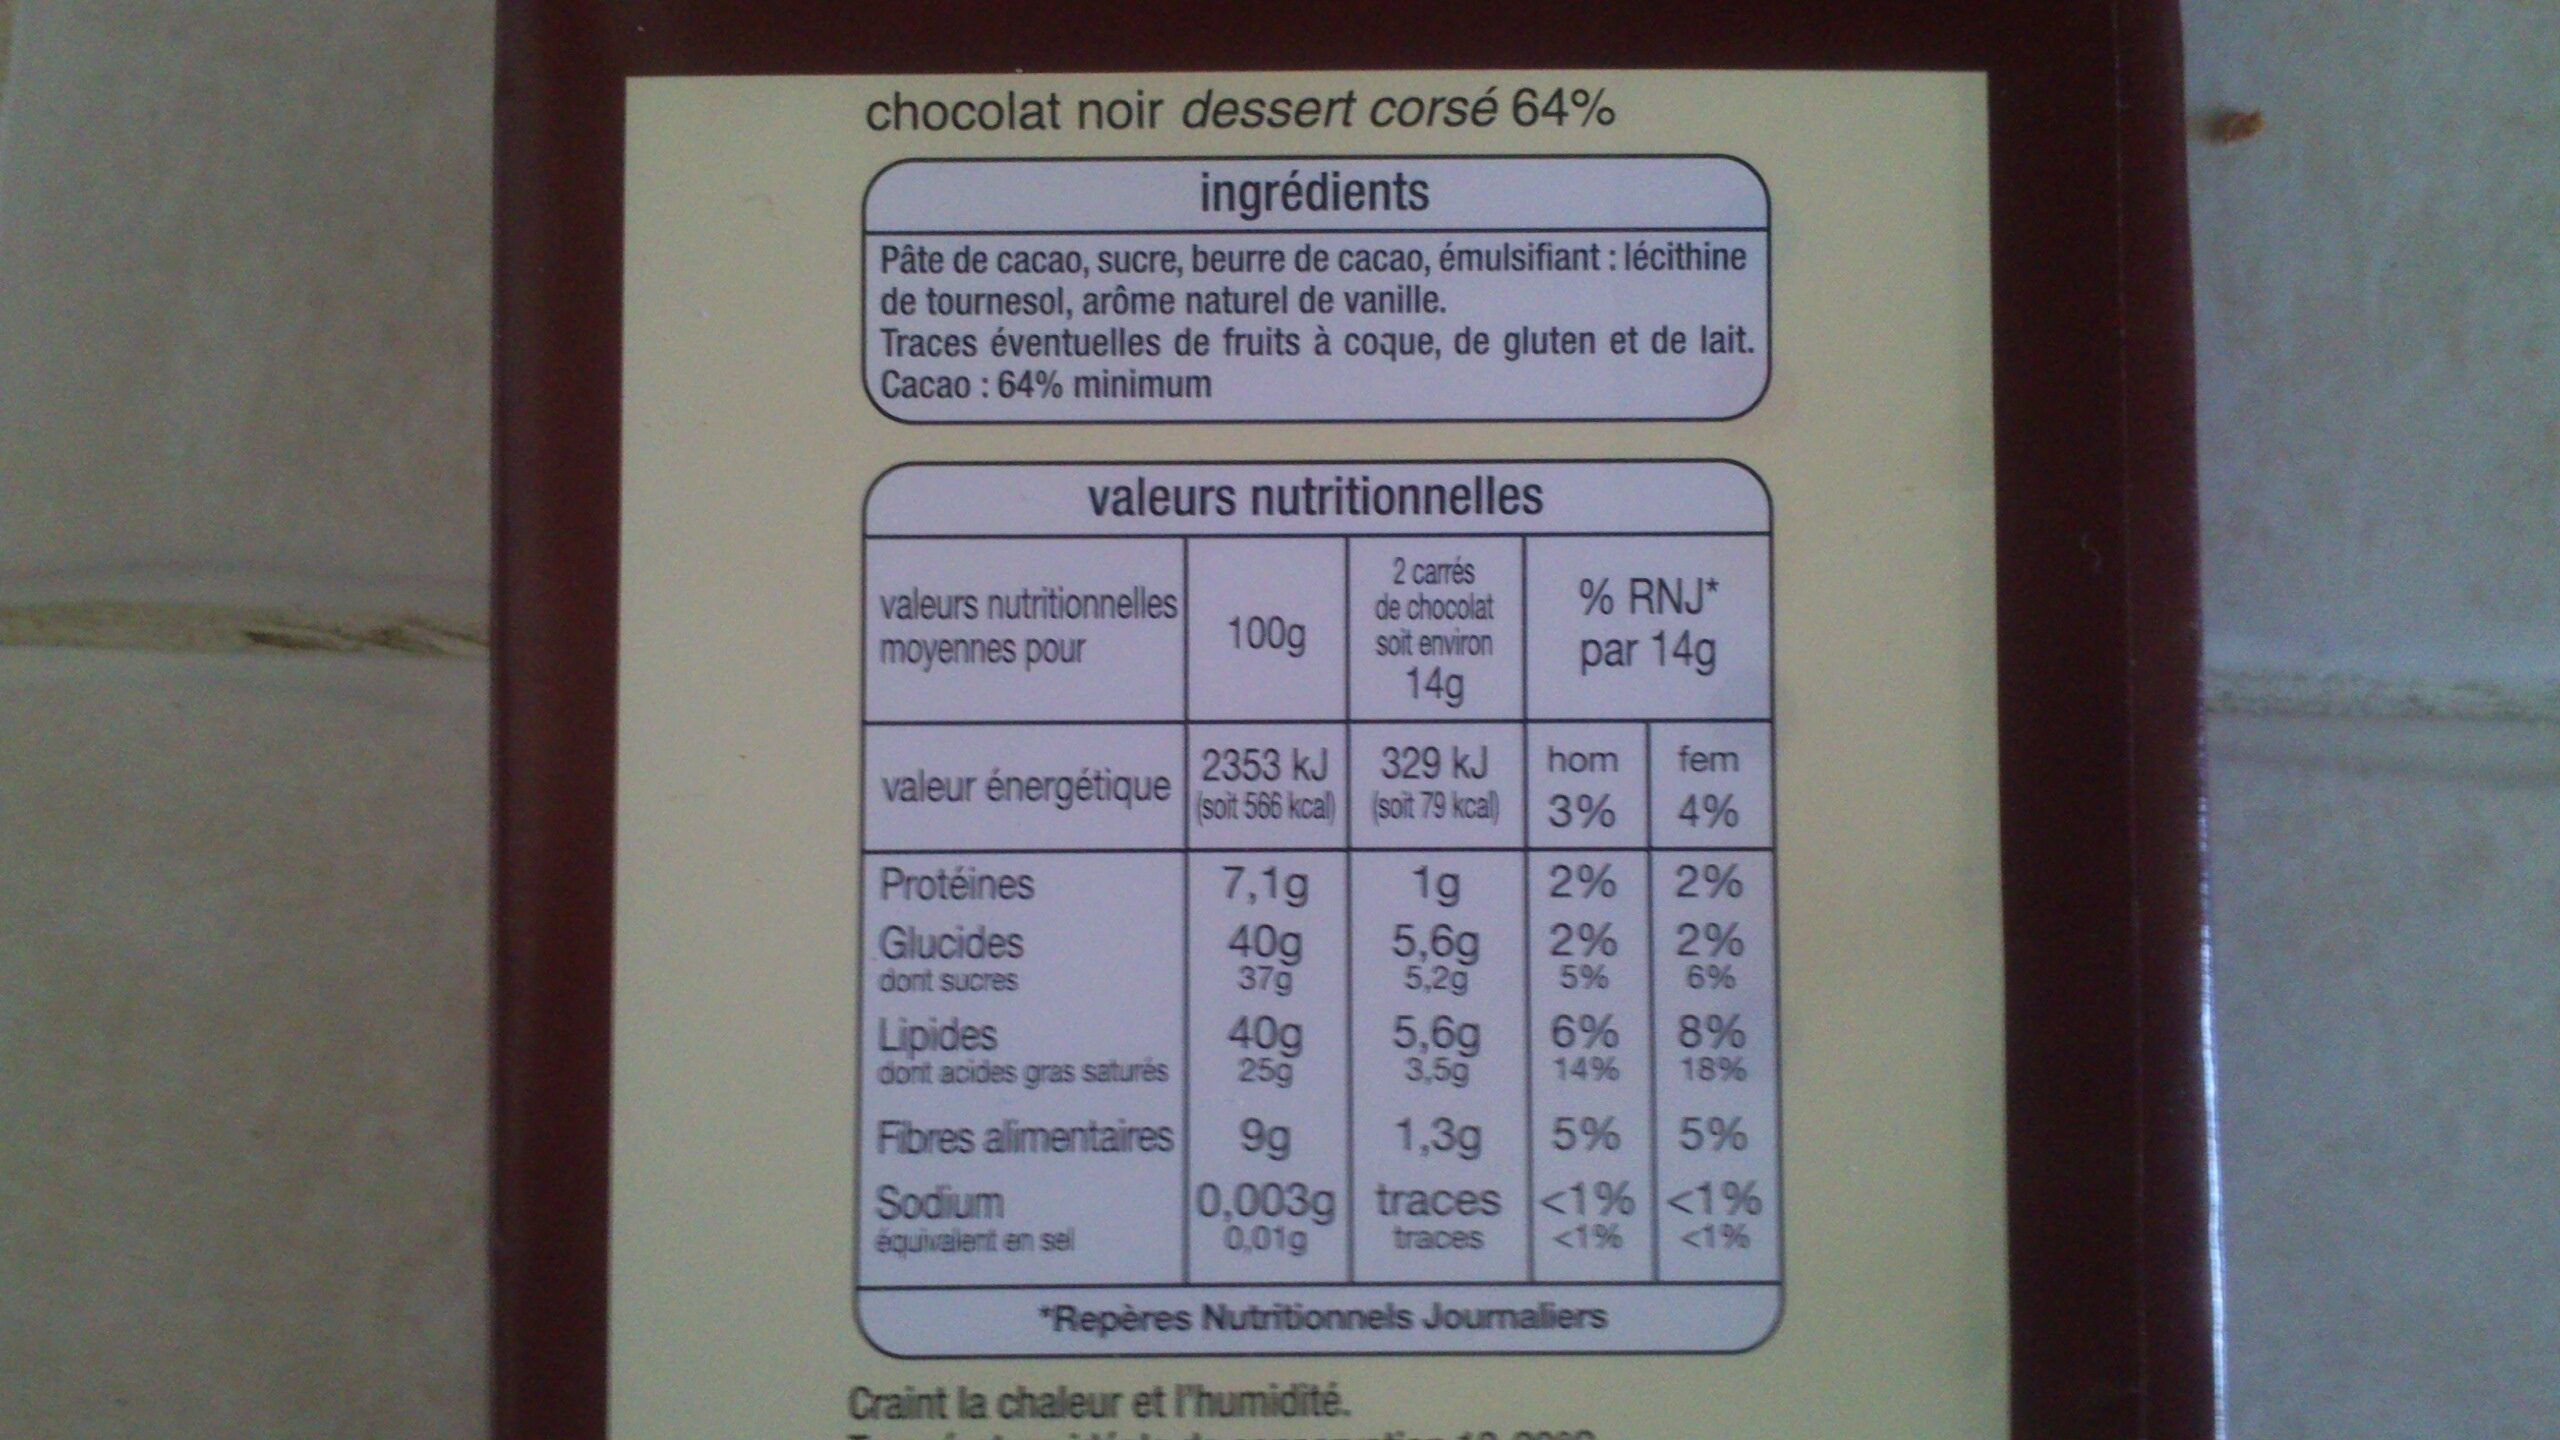 Corsé dessert - Ingrediënten